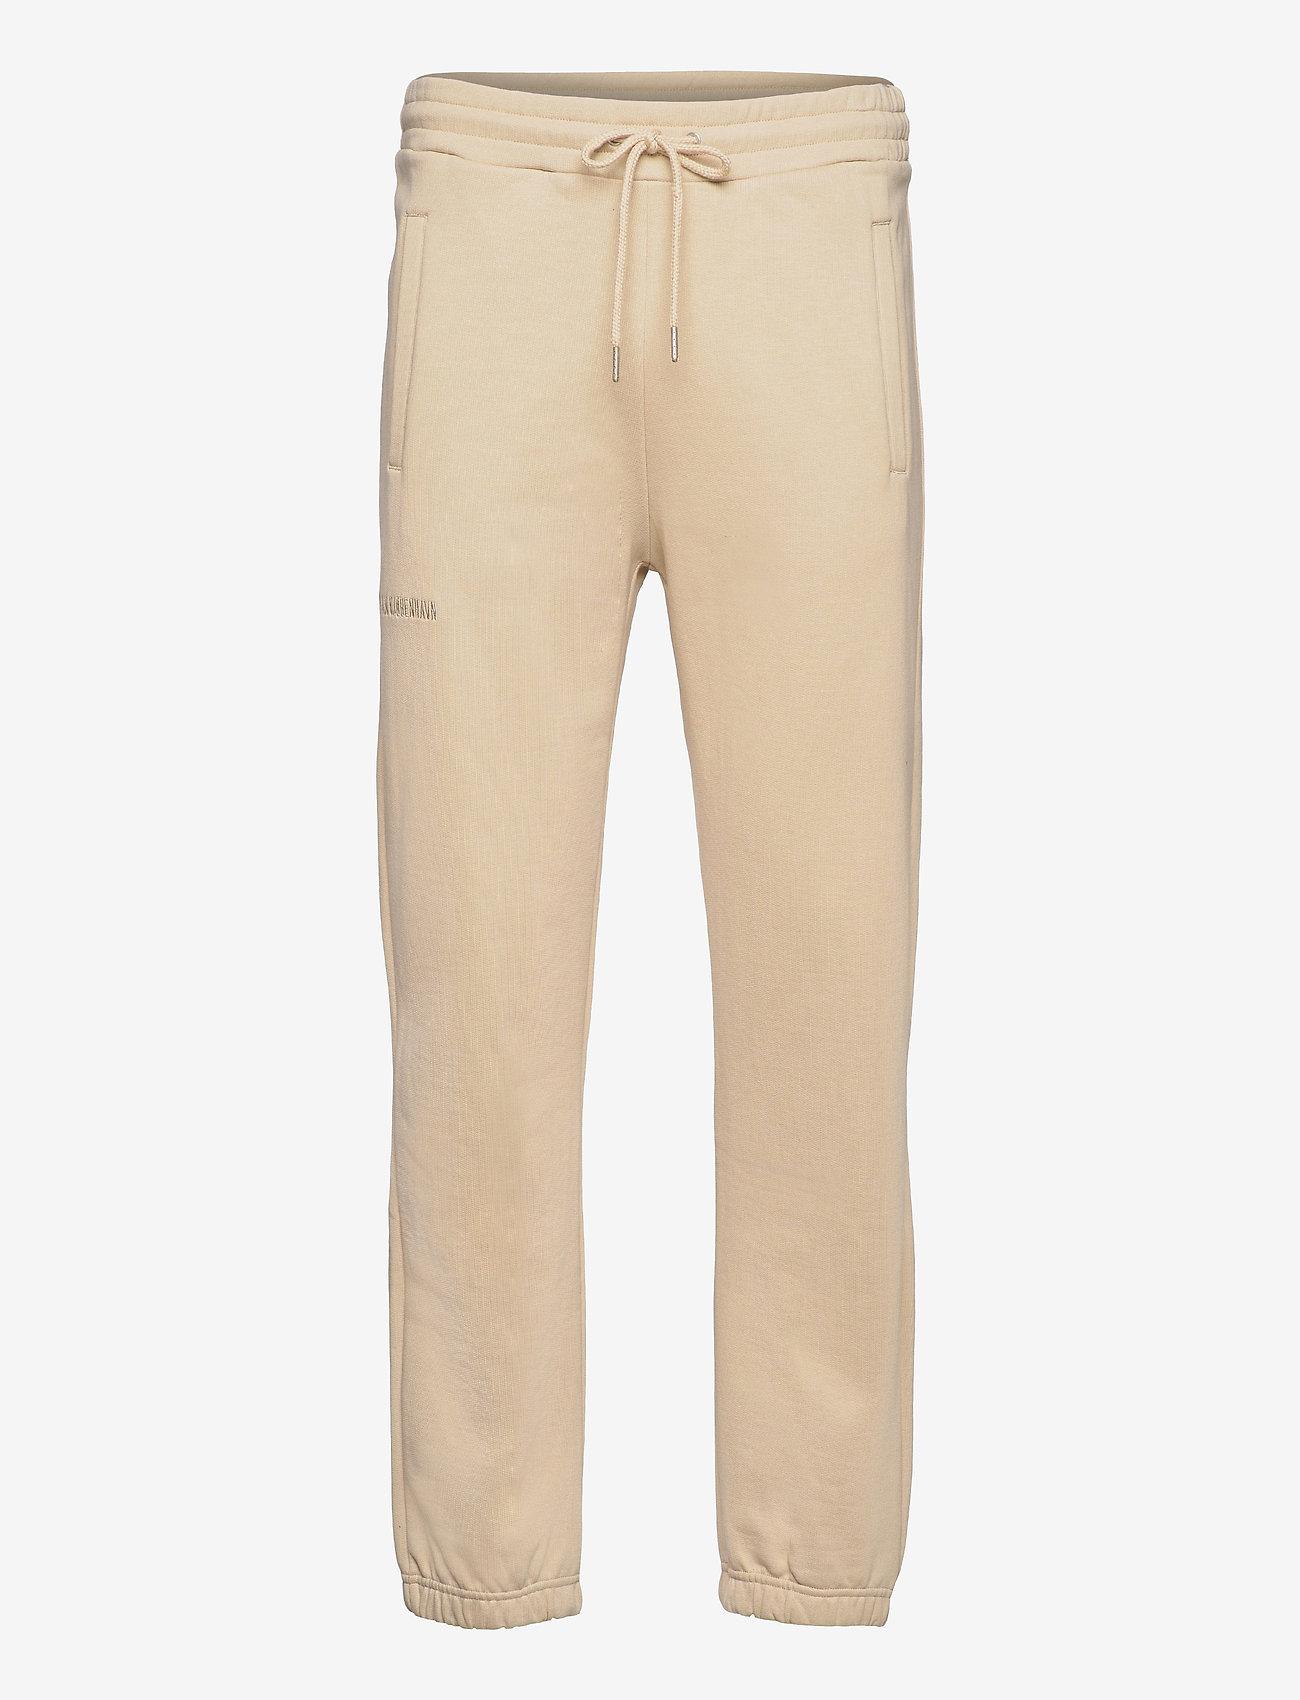 HAN Kjøbenhavn - Sweatpants - kleding - sand - 0